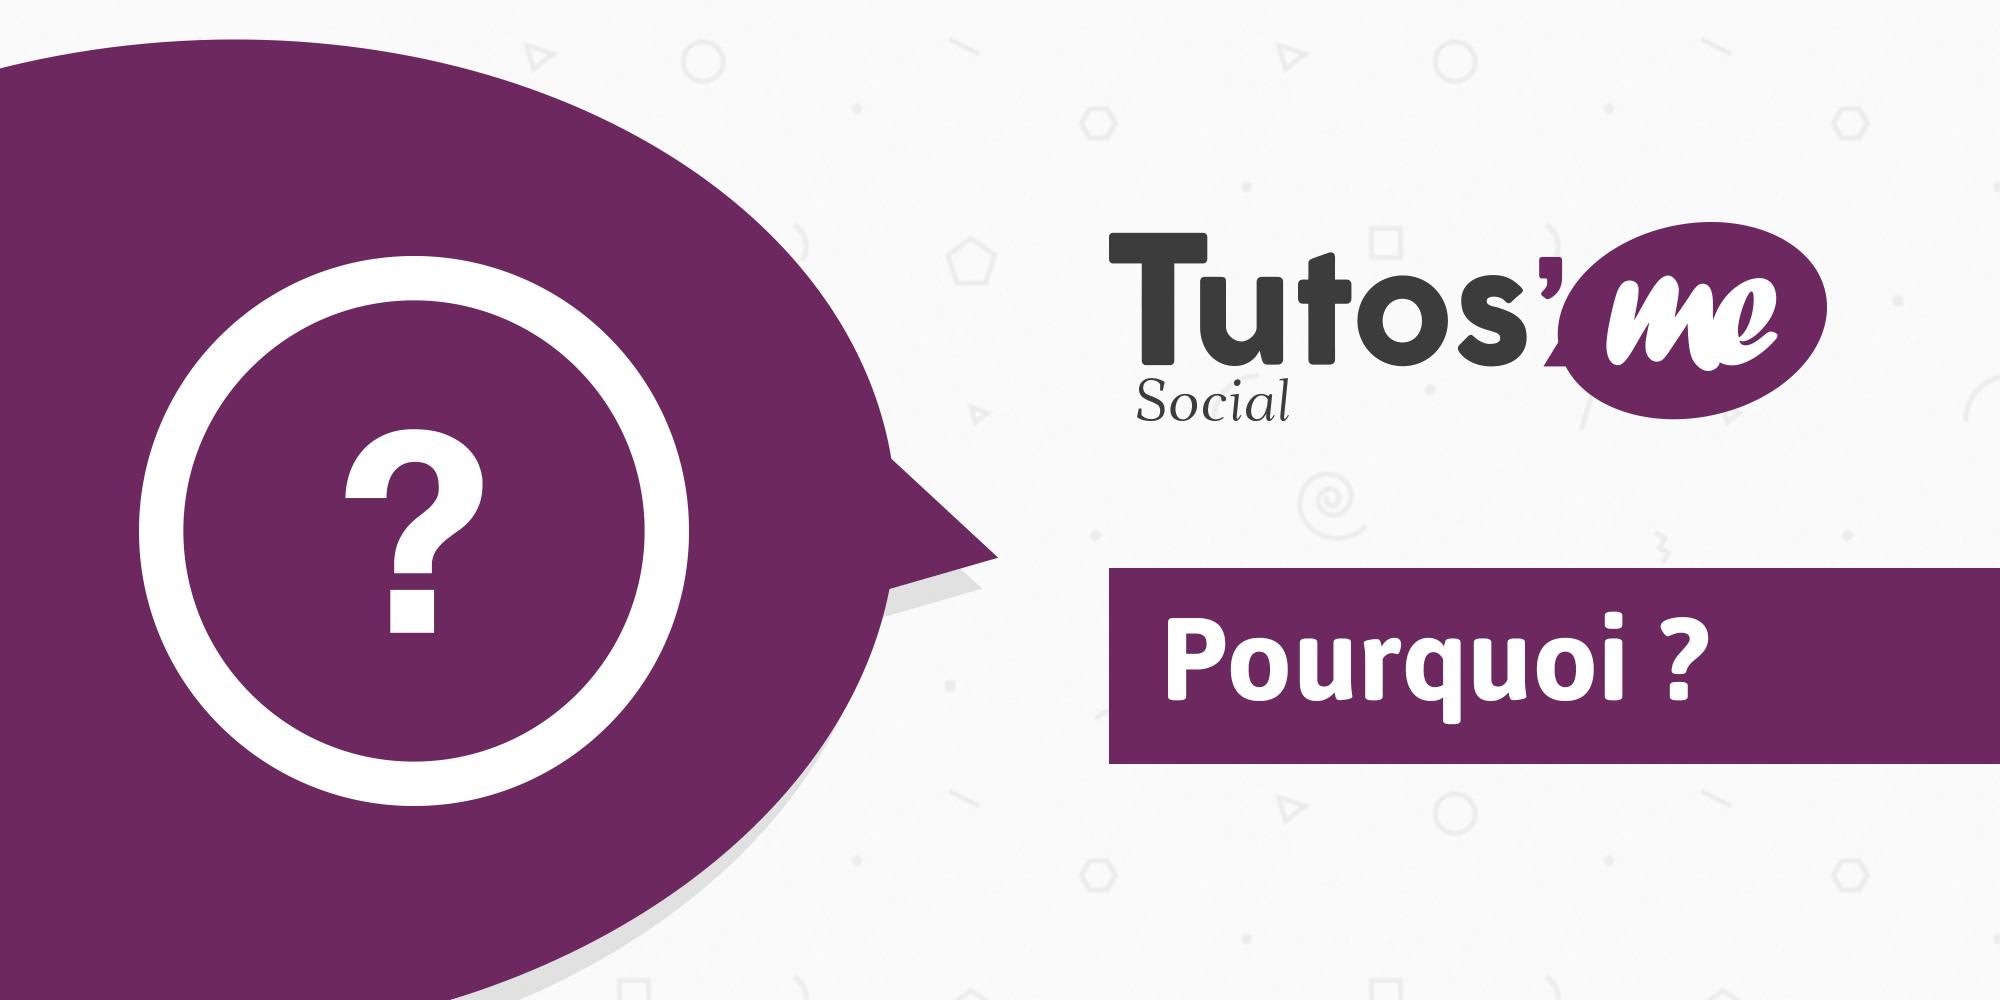 Tutos'Me Social : pourquoi ?